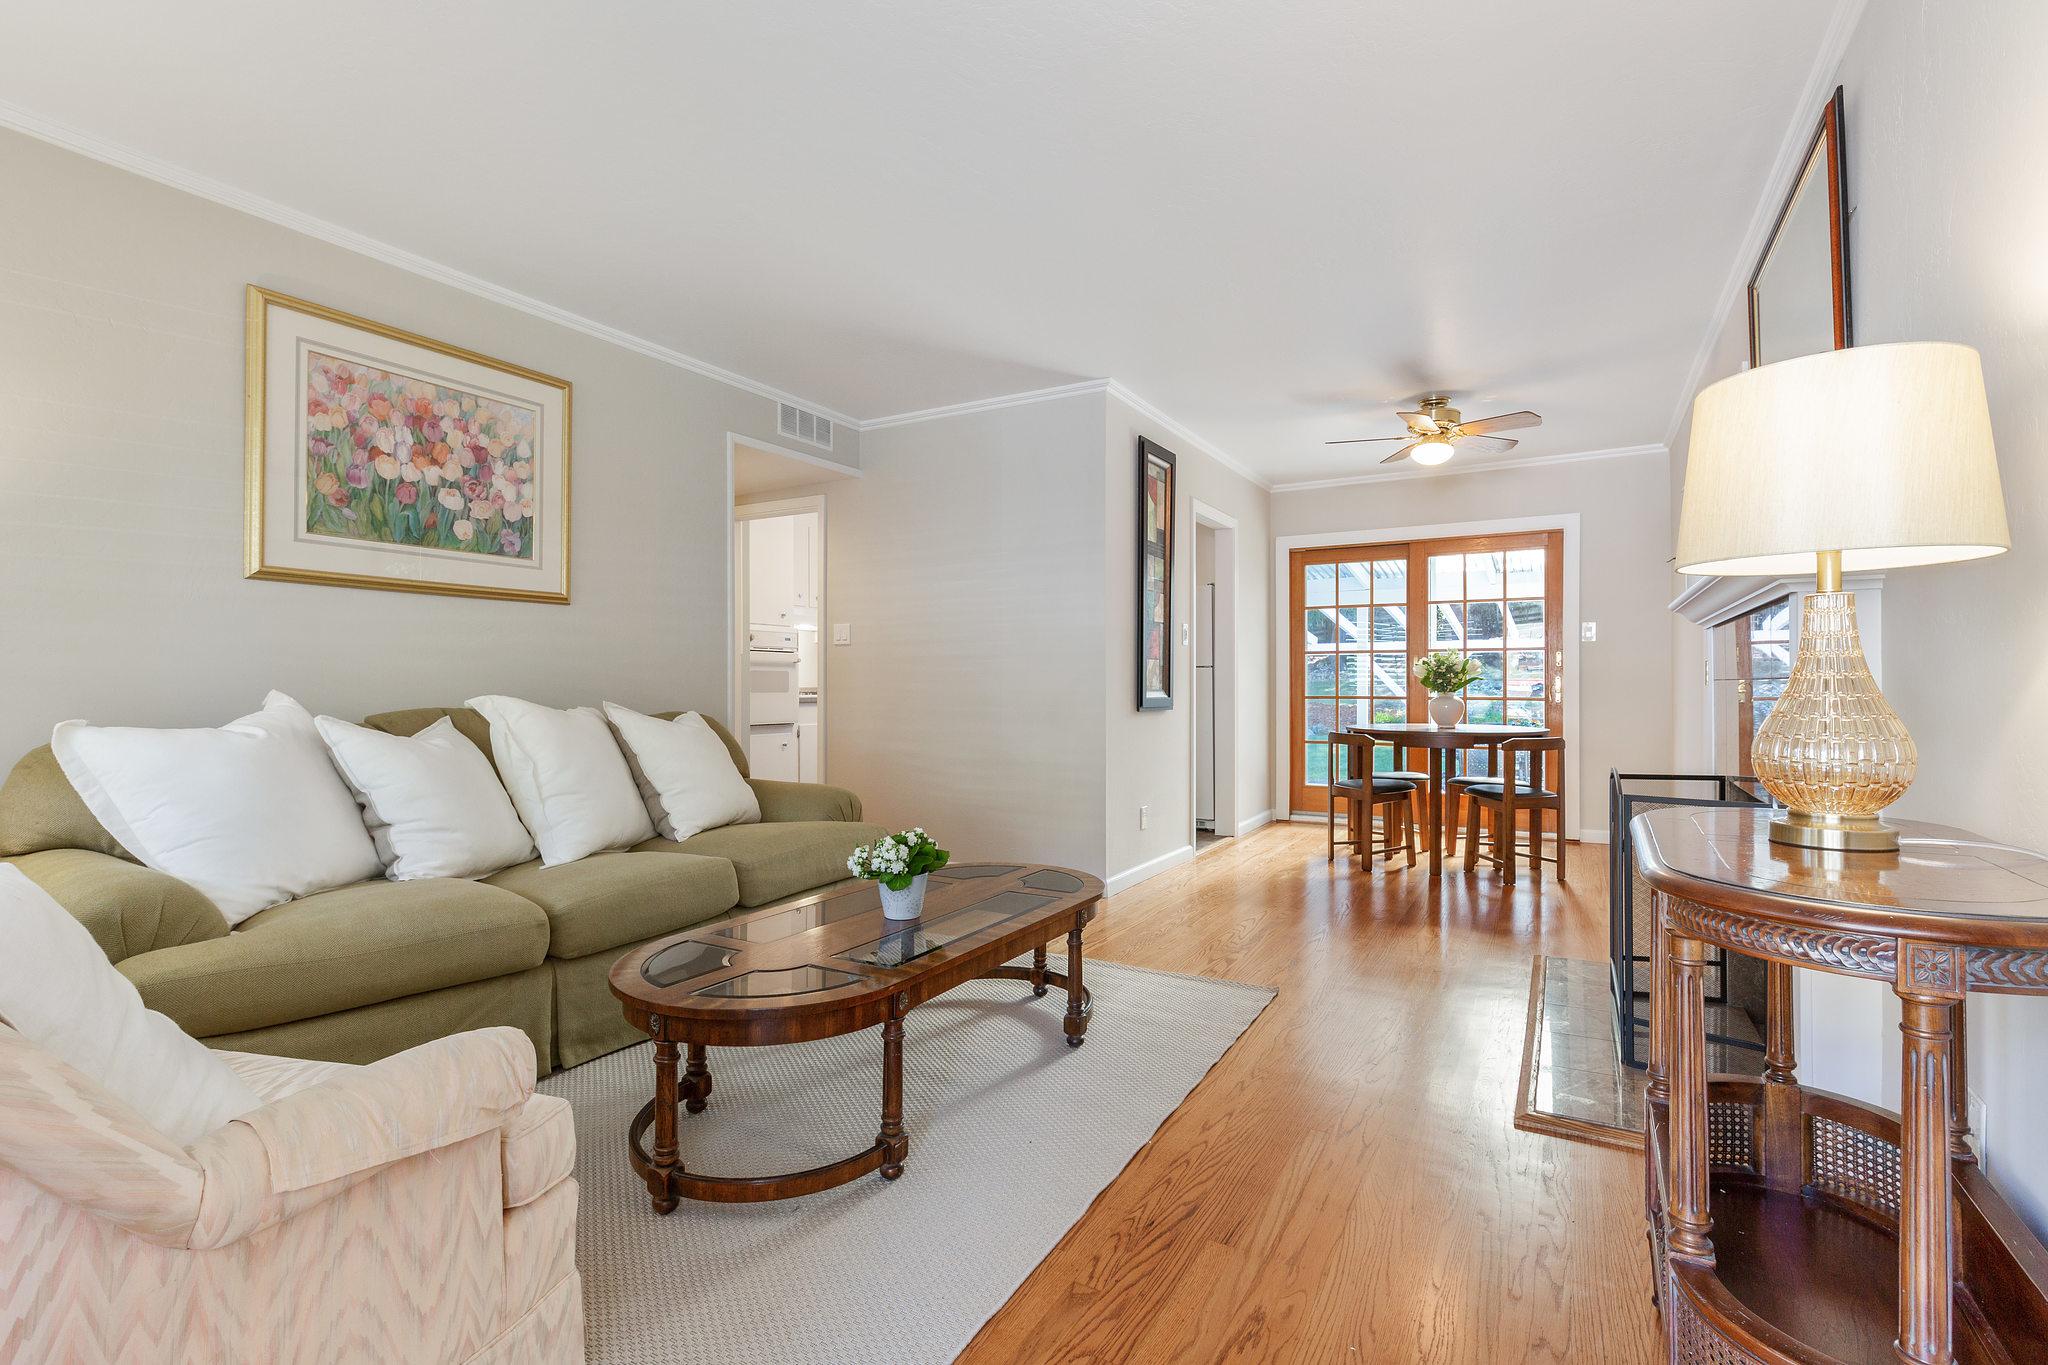 707 Cherry Living Room and hardwood floors